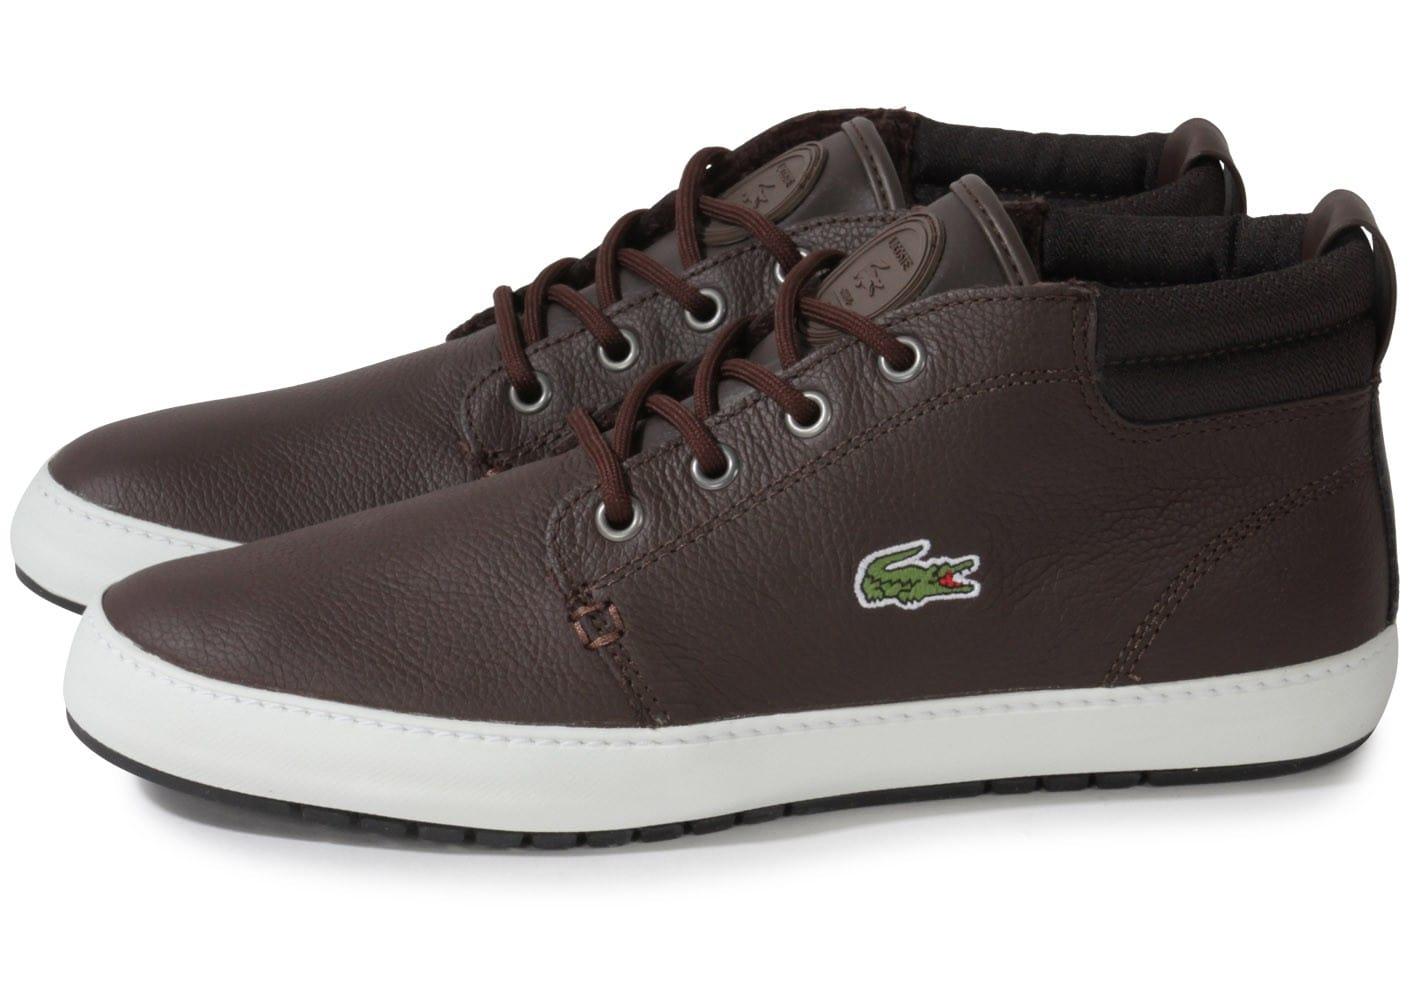 709e95e7dd chaussure lacoste montant homme